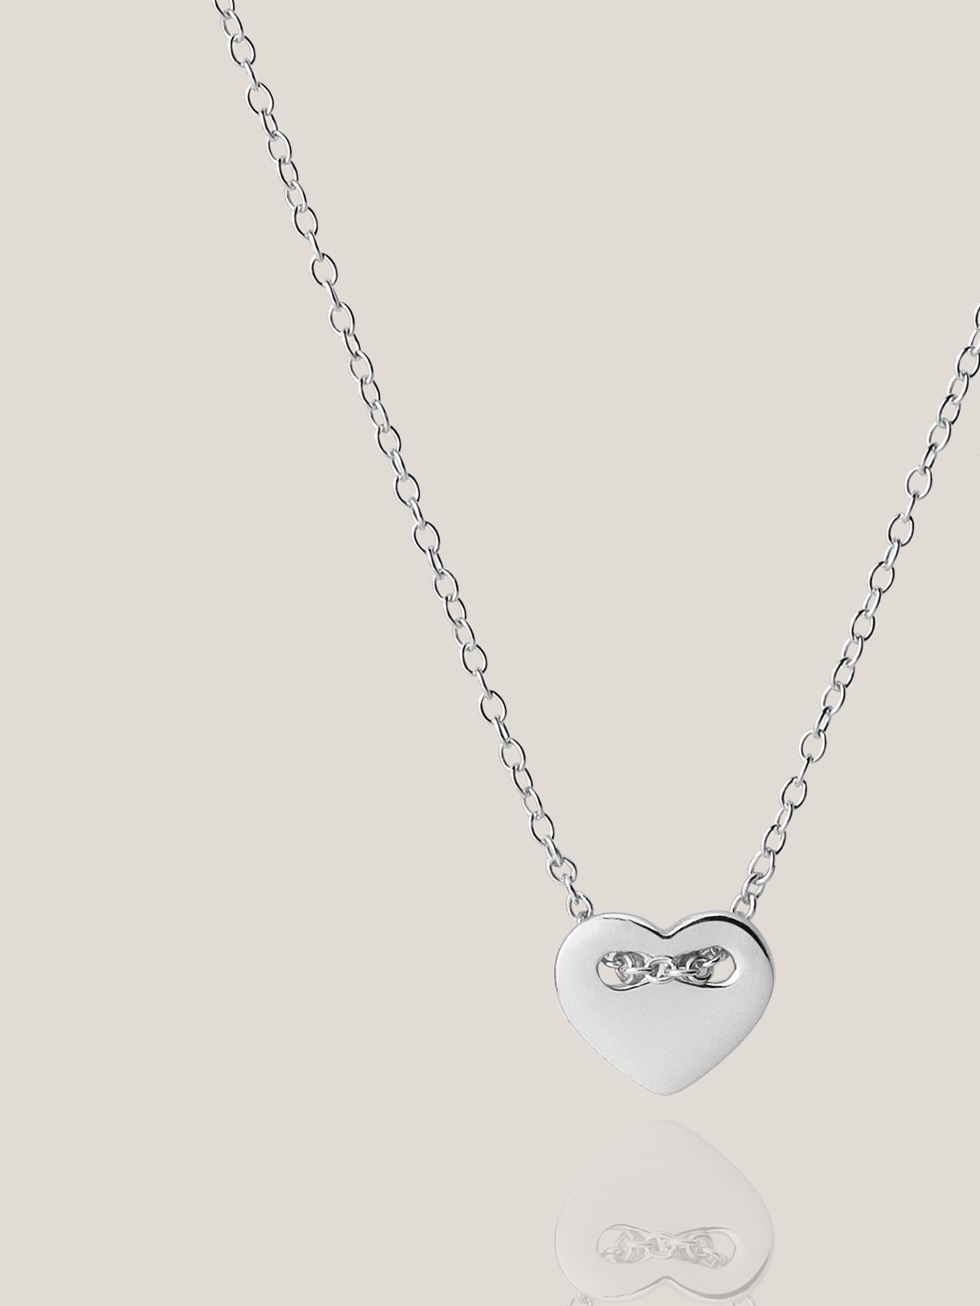 Collar sweetheart slv02